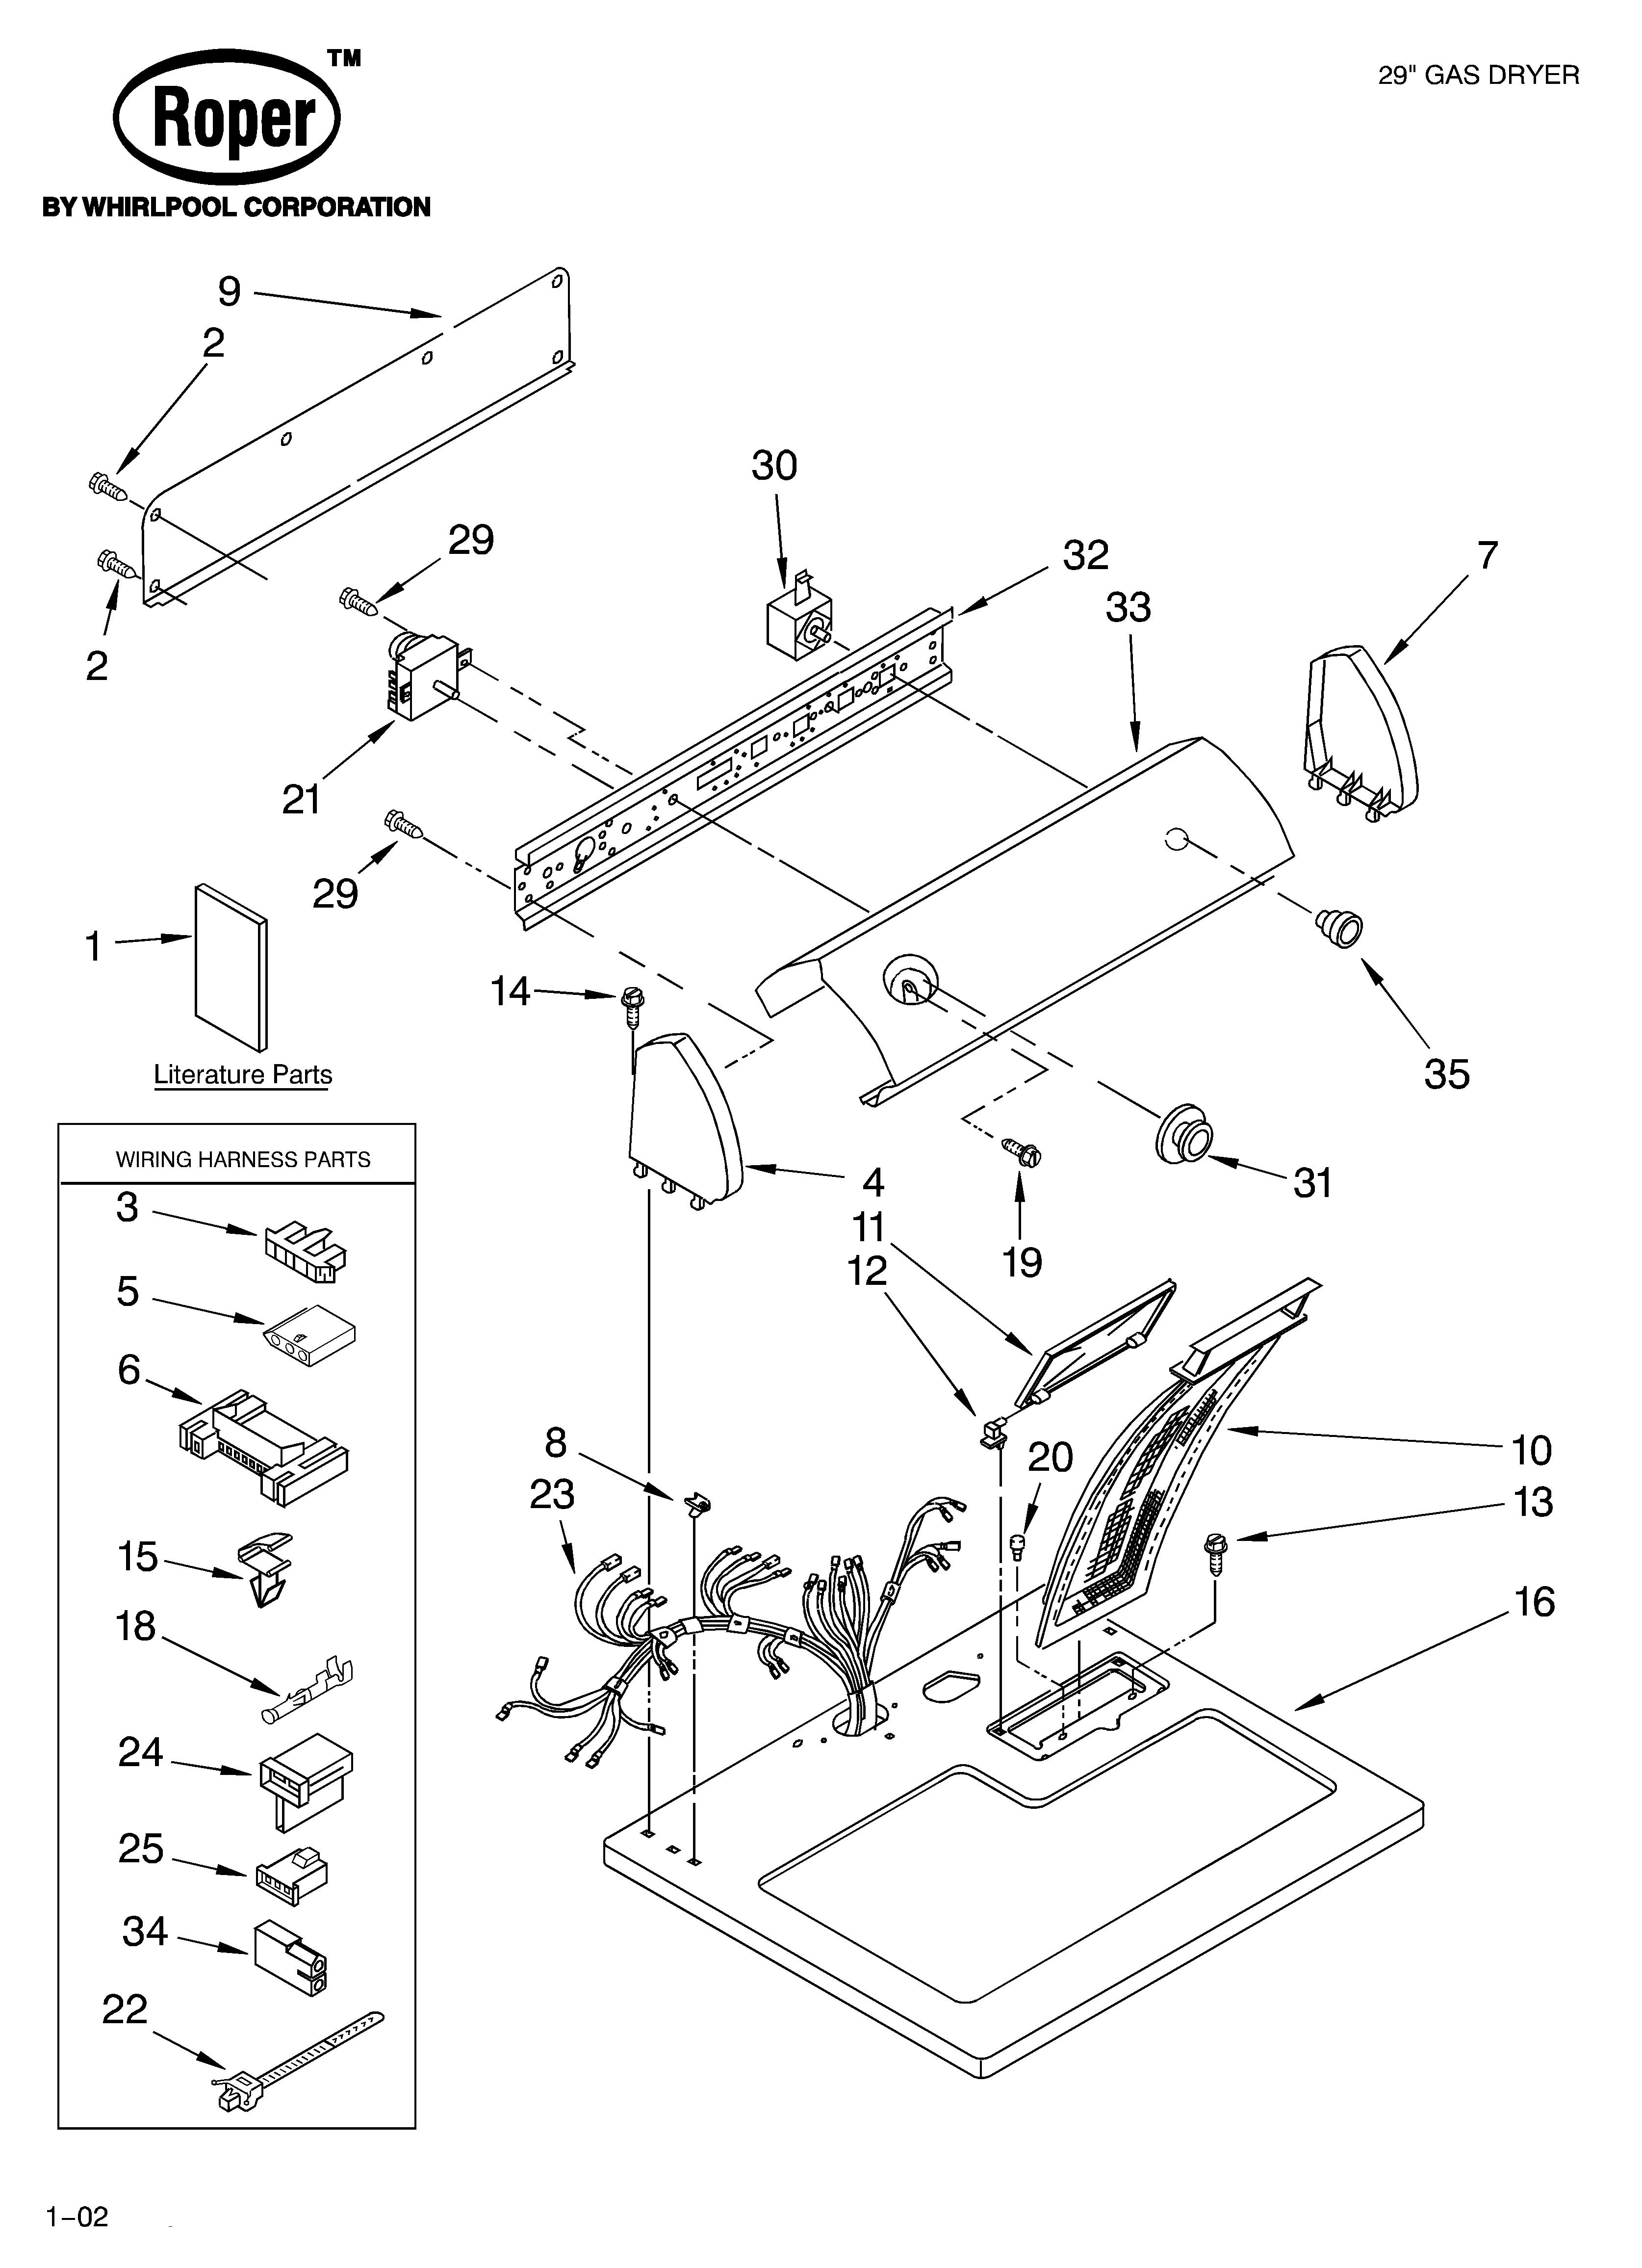 [DIAGRAM] Wiring Diagram Roper Electric Dryer FULL Version